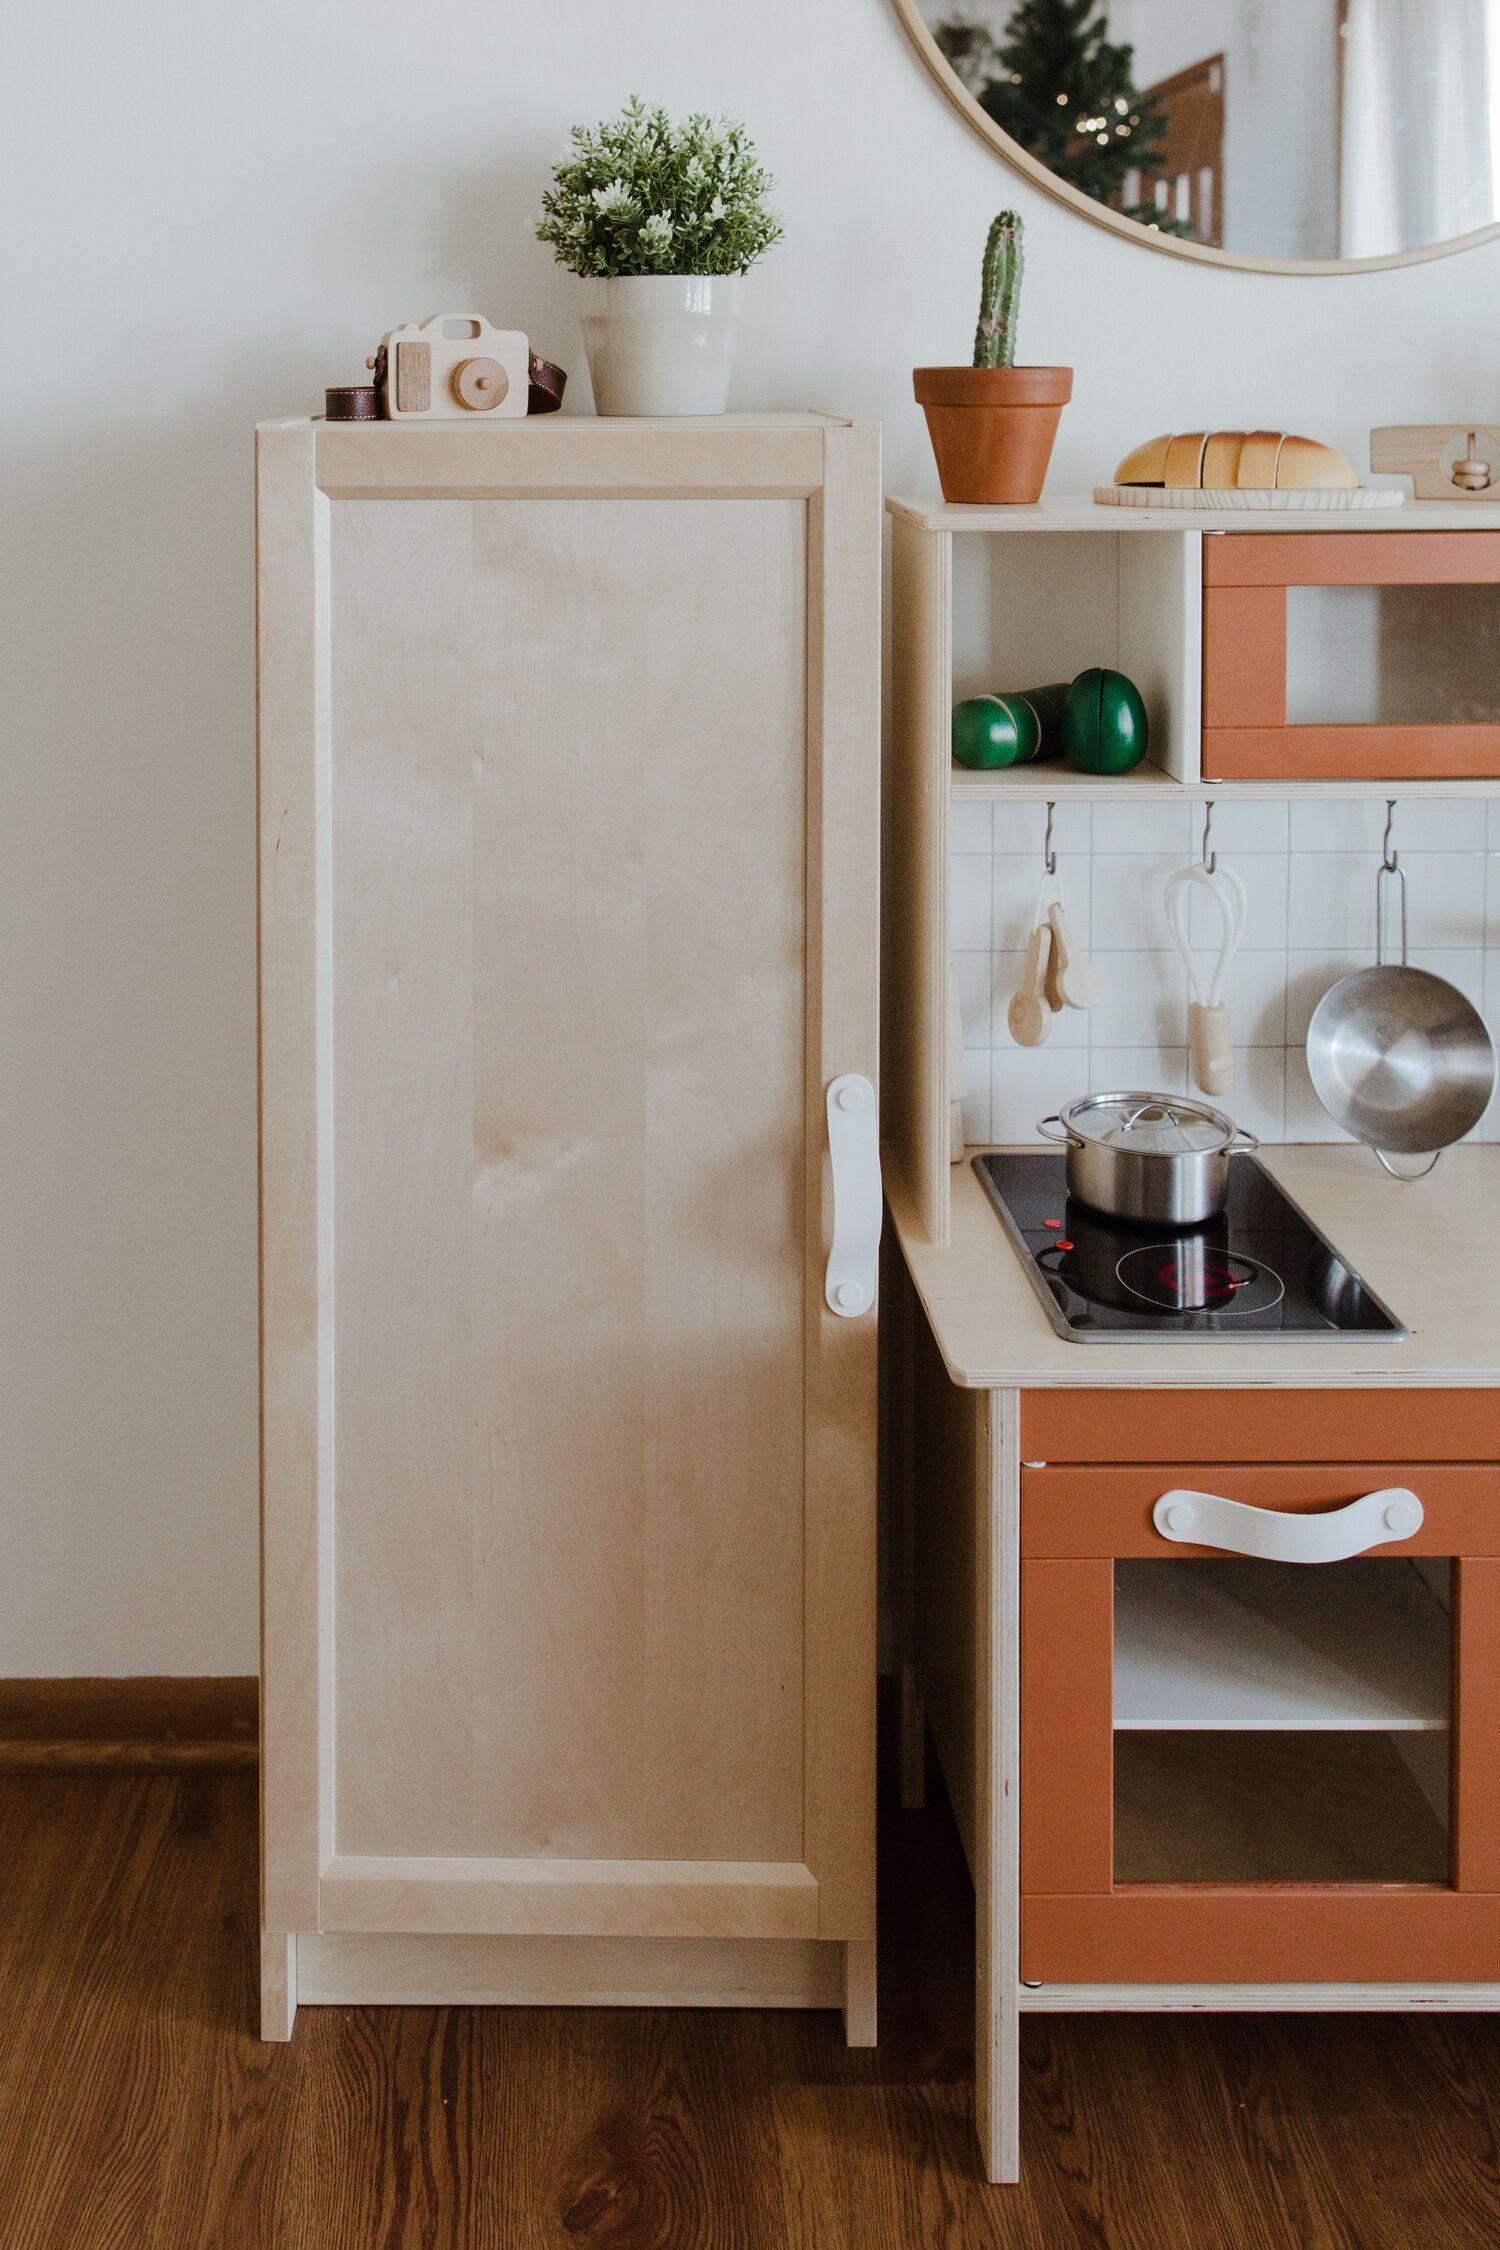 IKEA DUKTIG PLAY KITCHEN MAKEOVER + REFRIGERATOR HACK